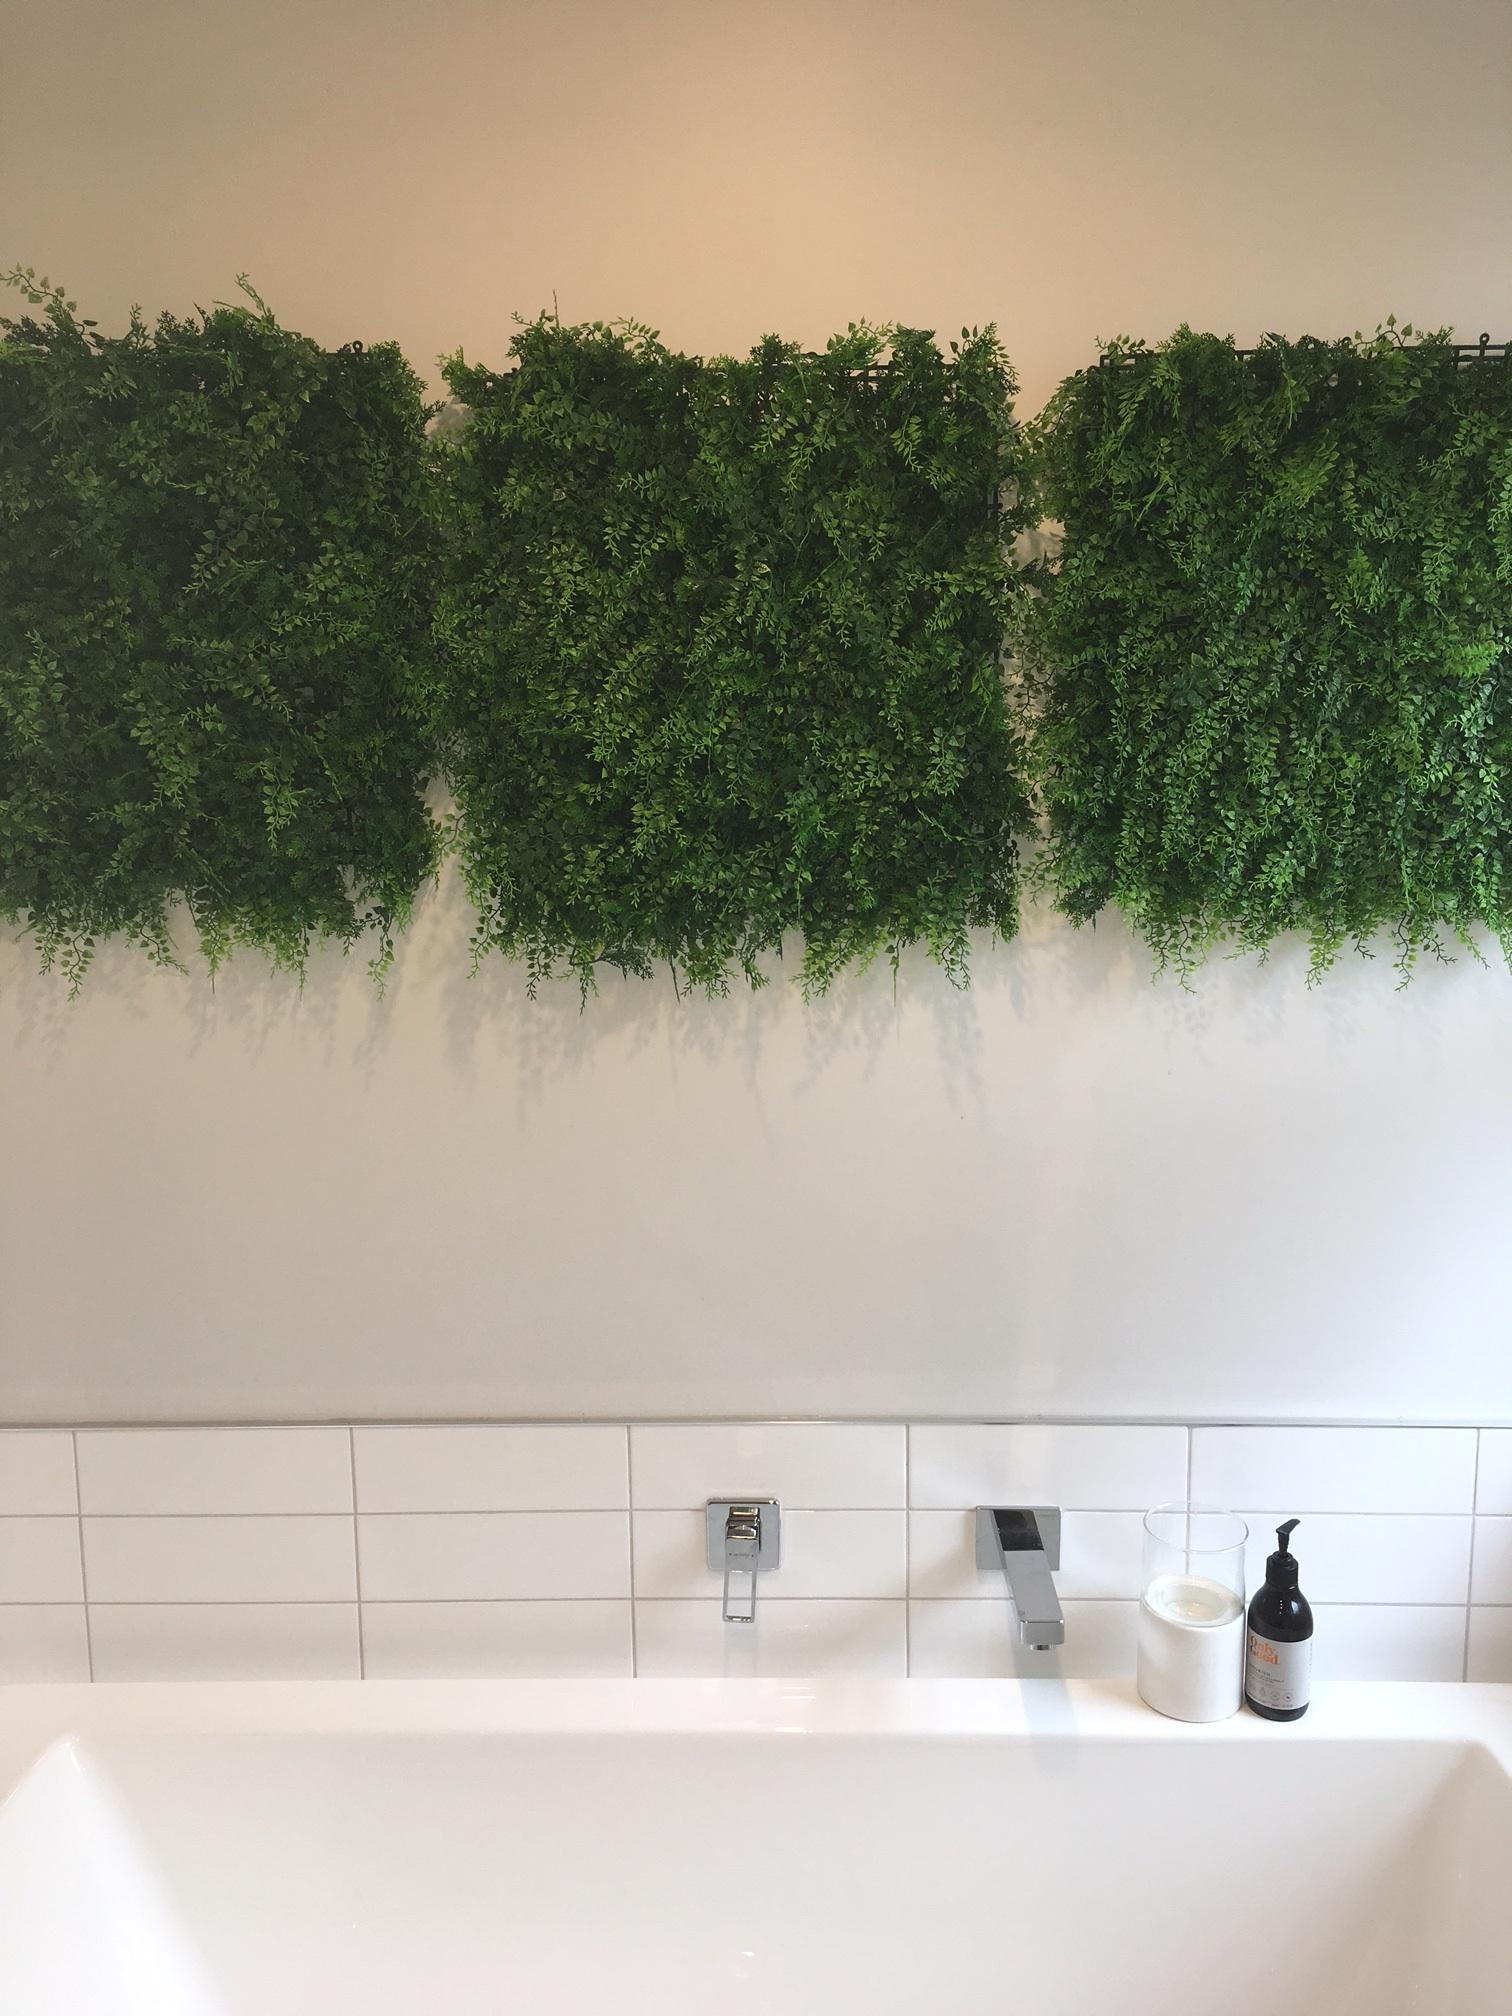 grace hynes loves design | interior design blog | new zealand